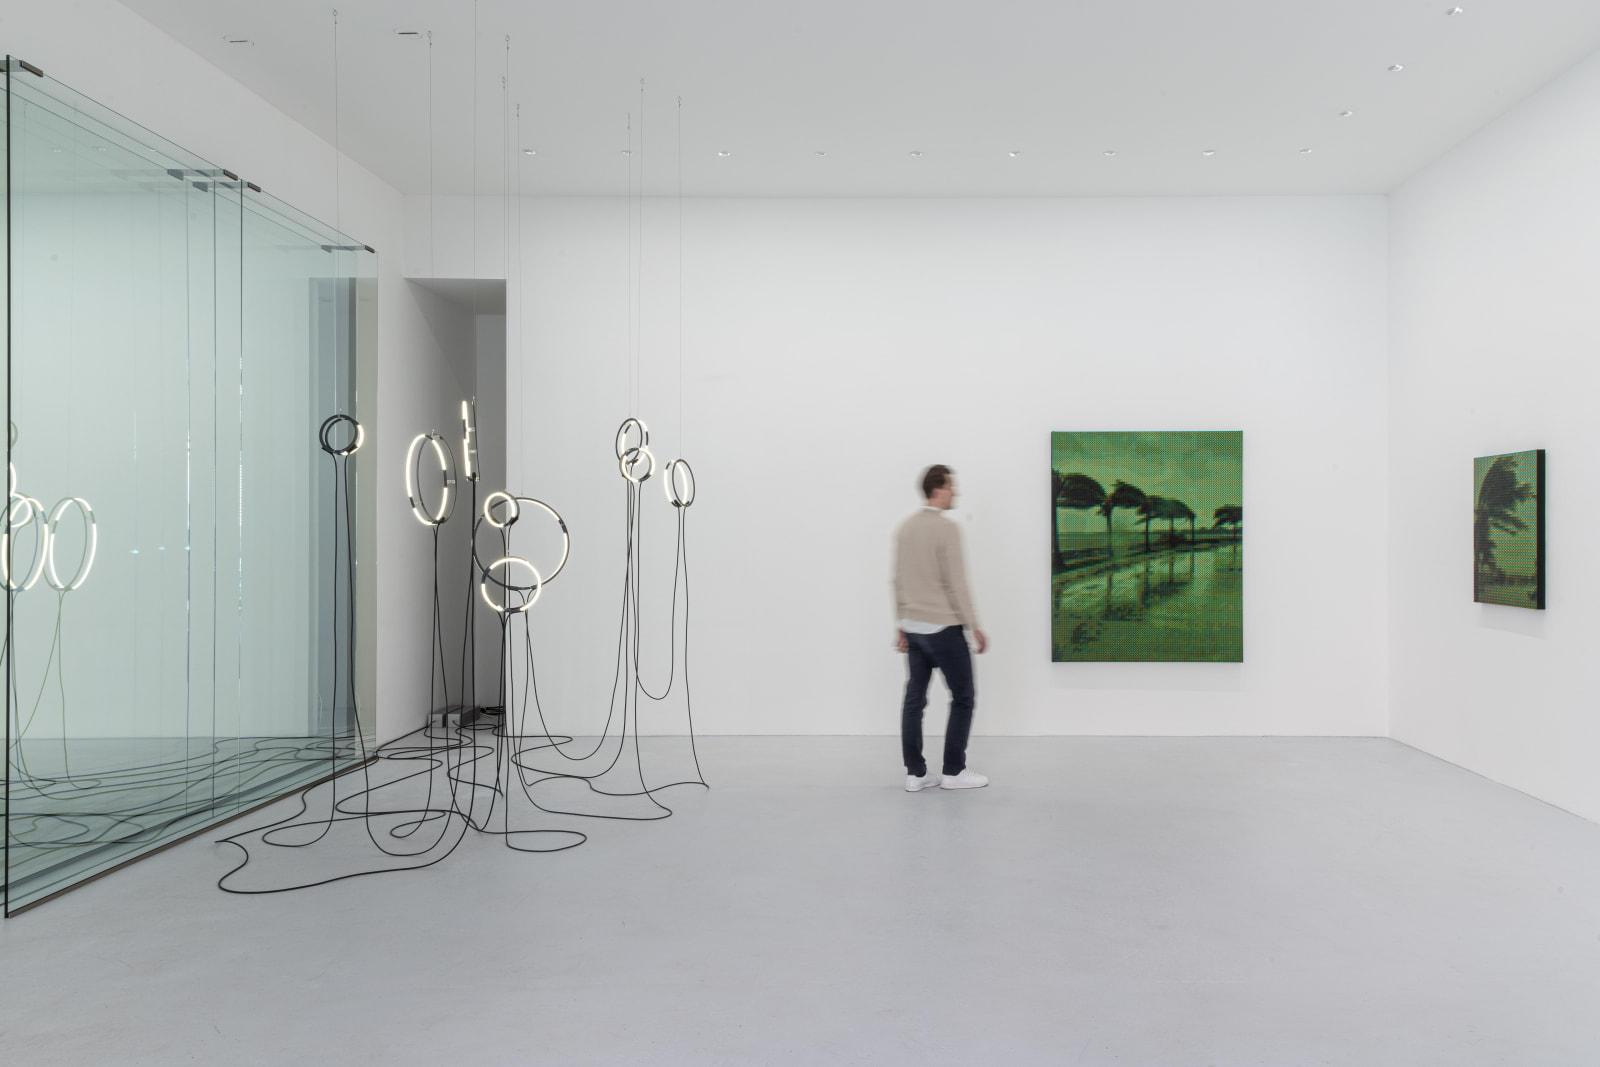 Installation view | poetics of reality (encoded) | brigitte kowanz and troika | max goelitz 2021 | Photo: Dirk Tacke